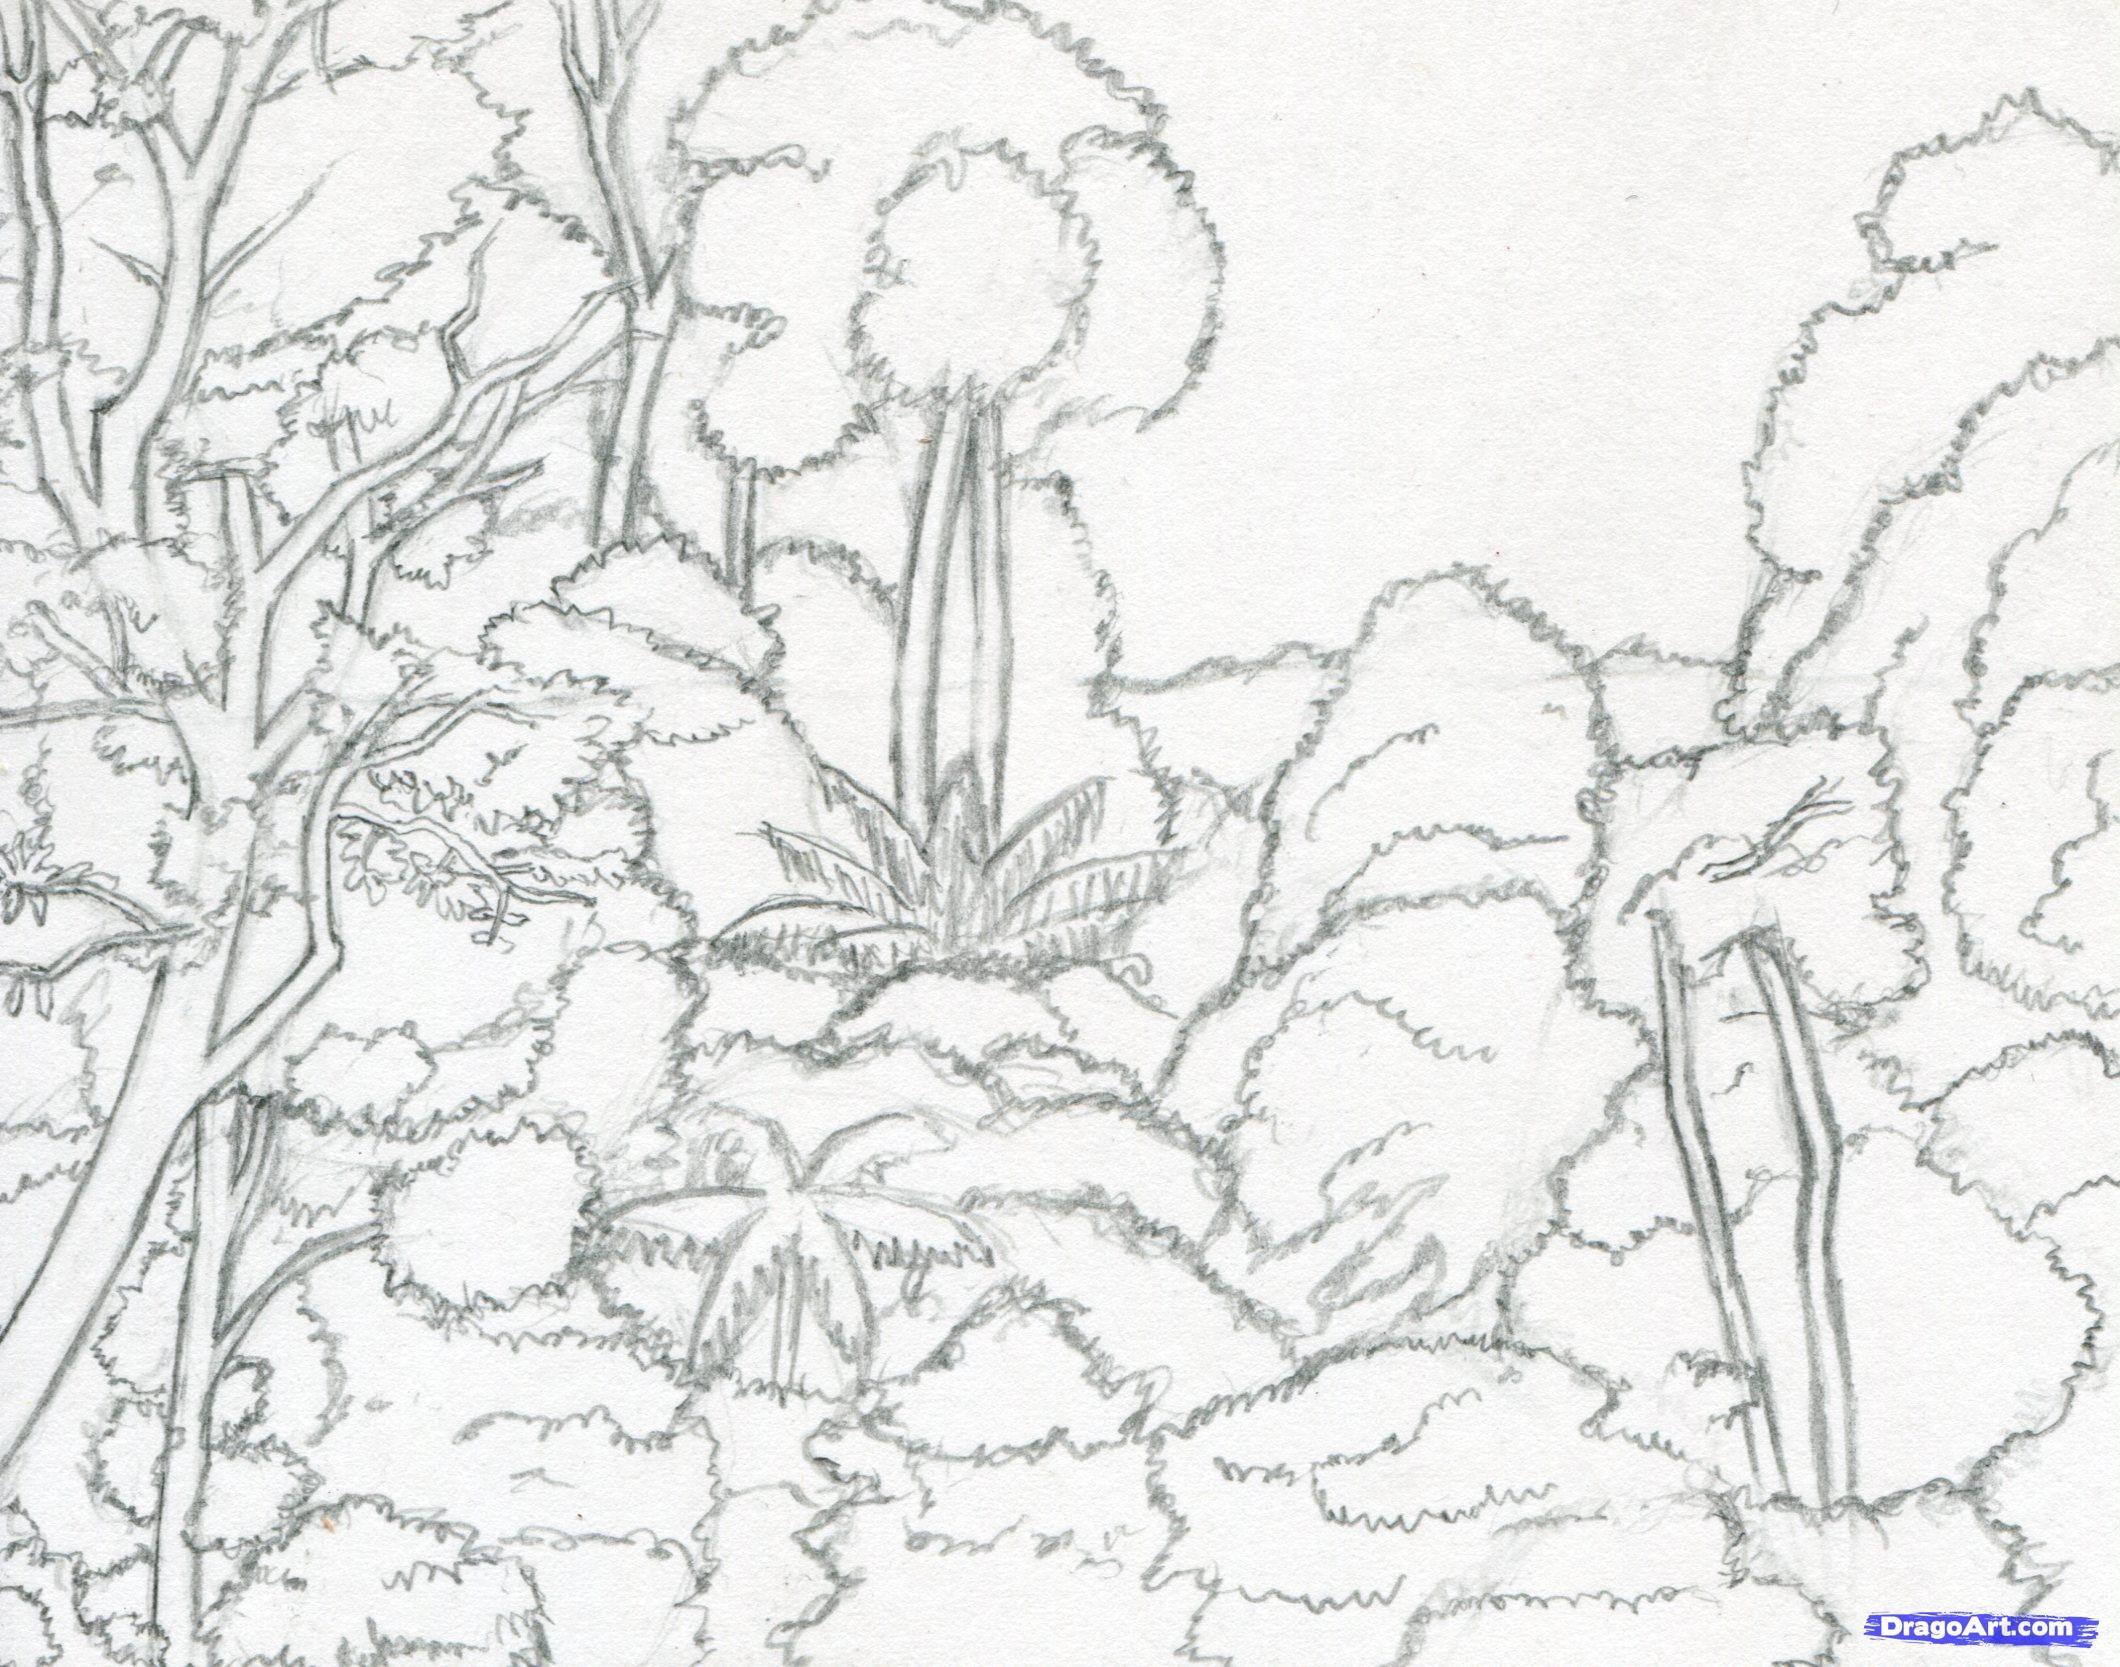 Tropical Rainforest Animals Drawing drawarainforest